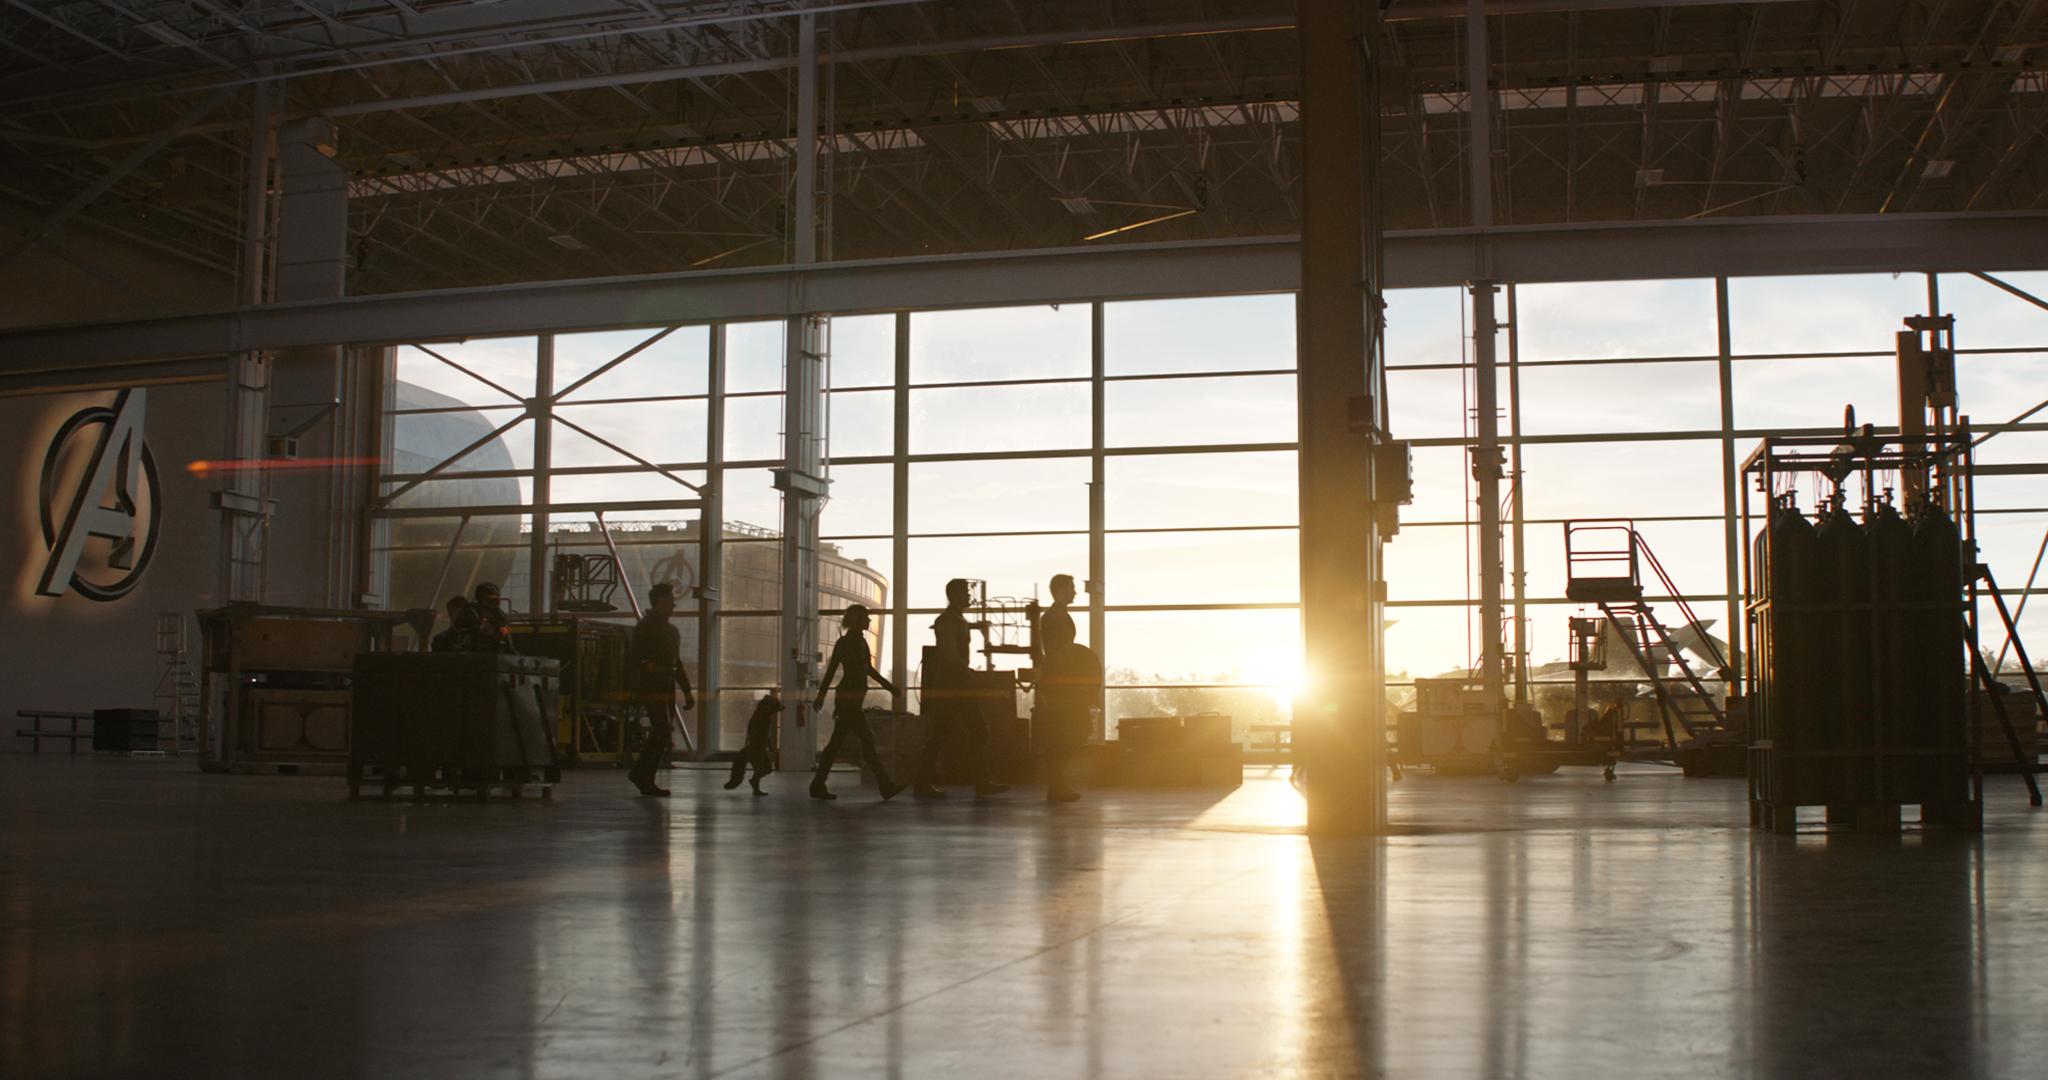 SOUNDTRACK REVIEW] Silvestri Champions 'Avengers: Endgame